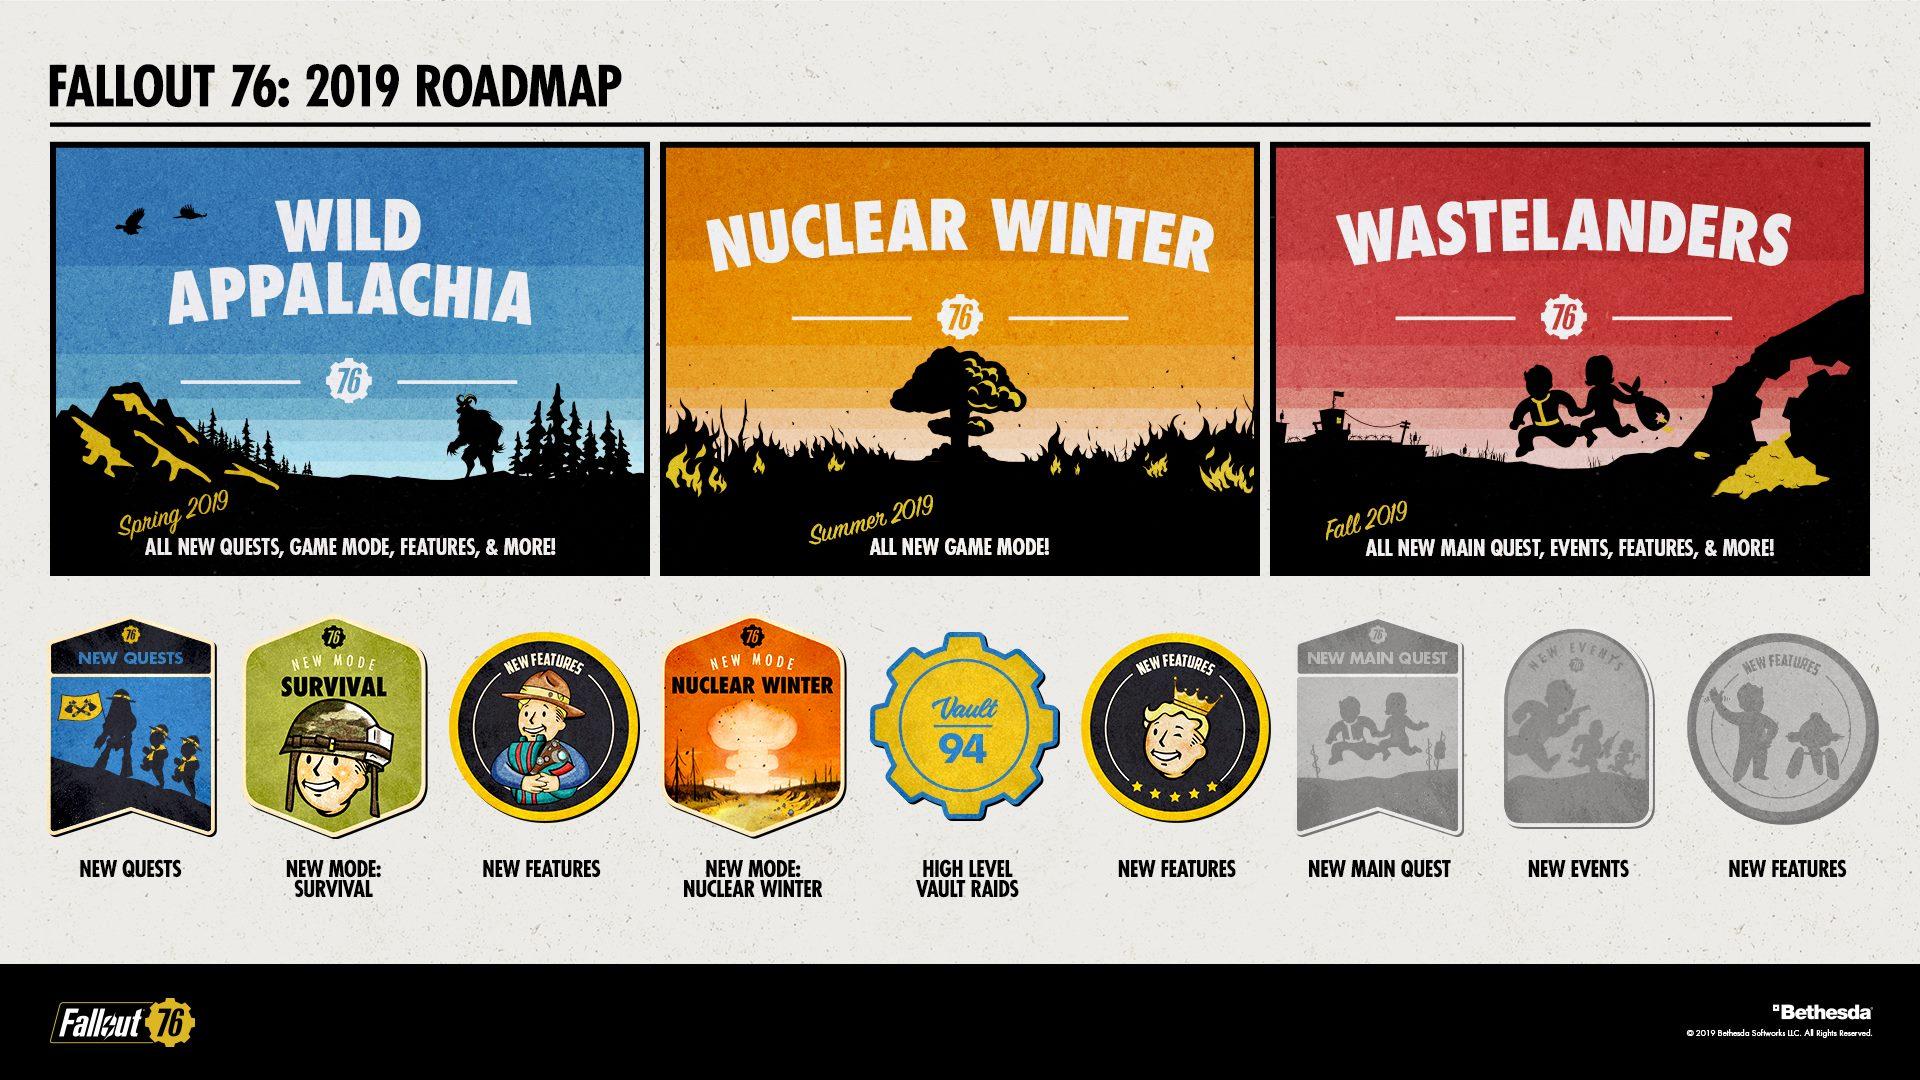 Fallout 76: Wild Appalachia Roadmap 2019